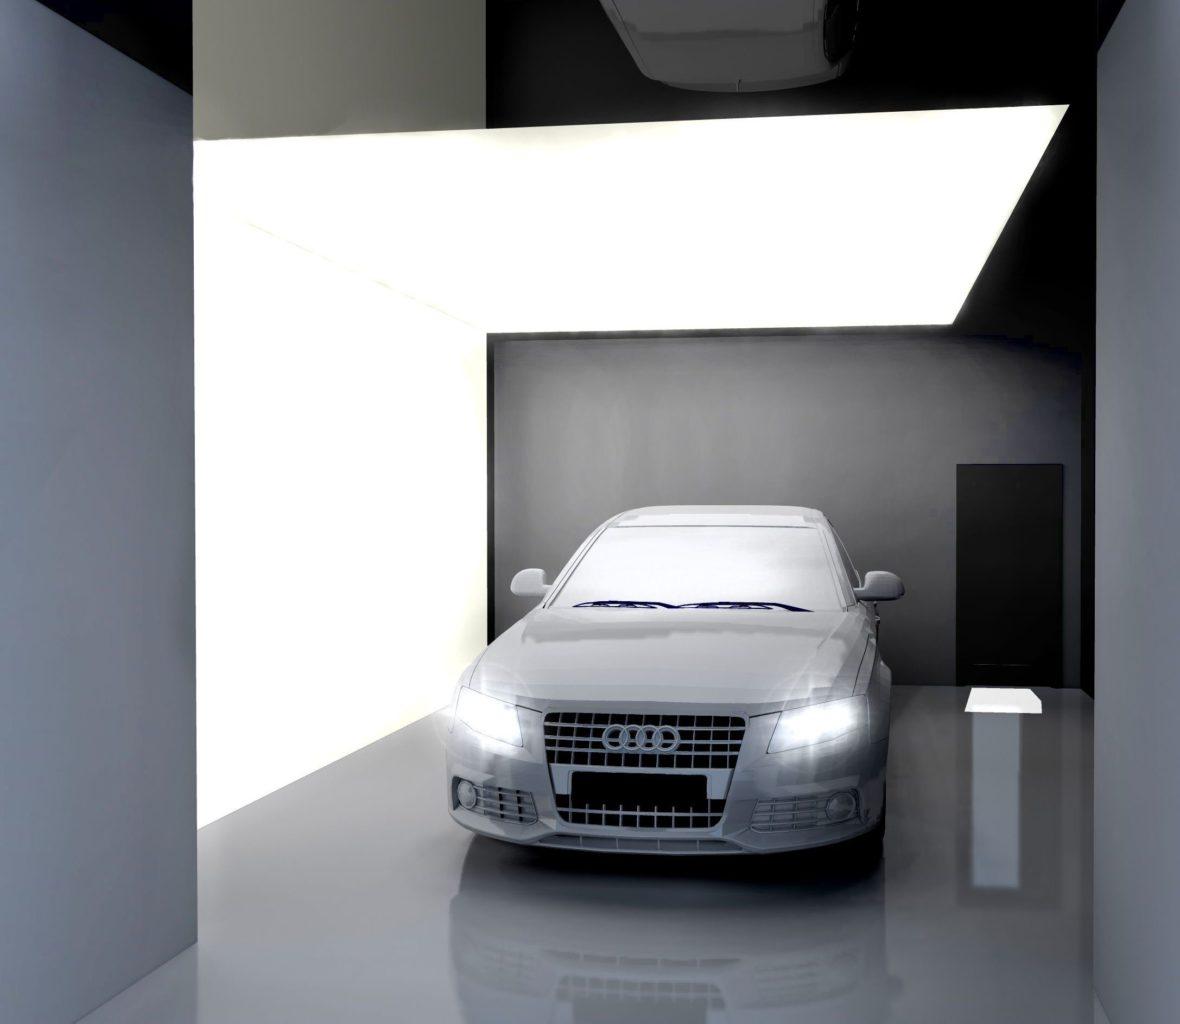 Spanplafond, Showroom, Akoestiek plafond, lichtplafond